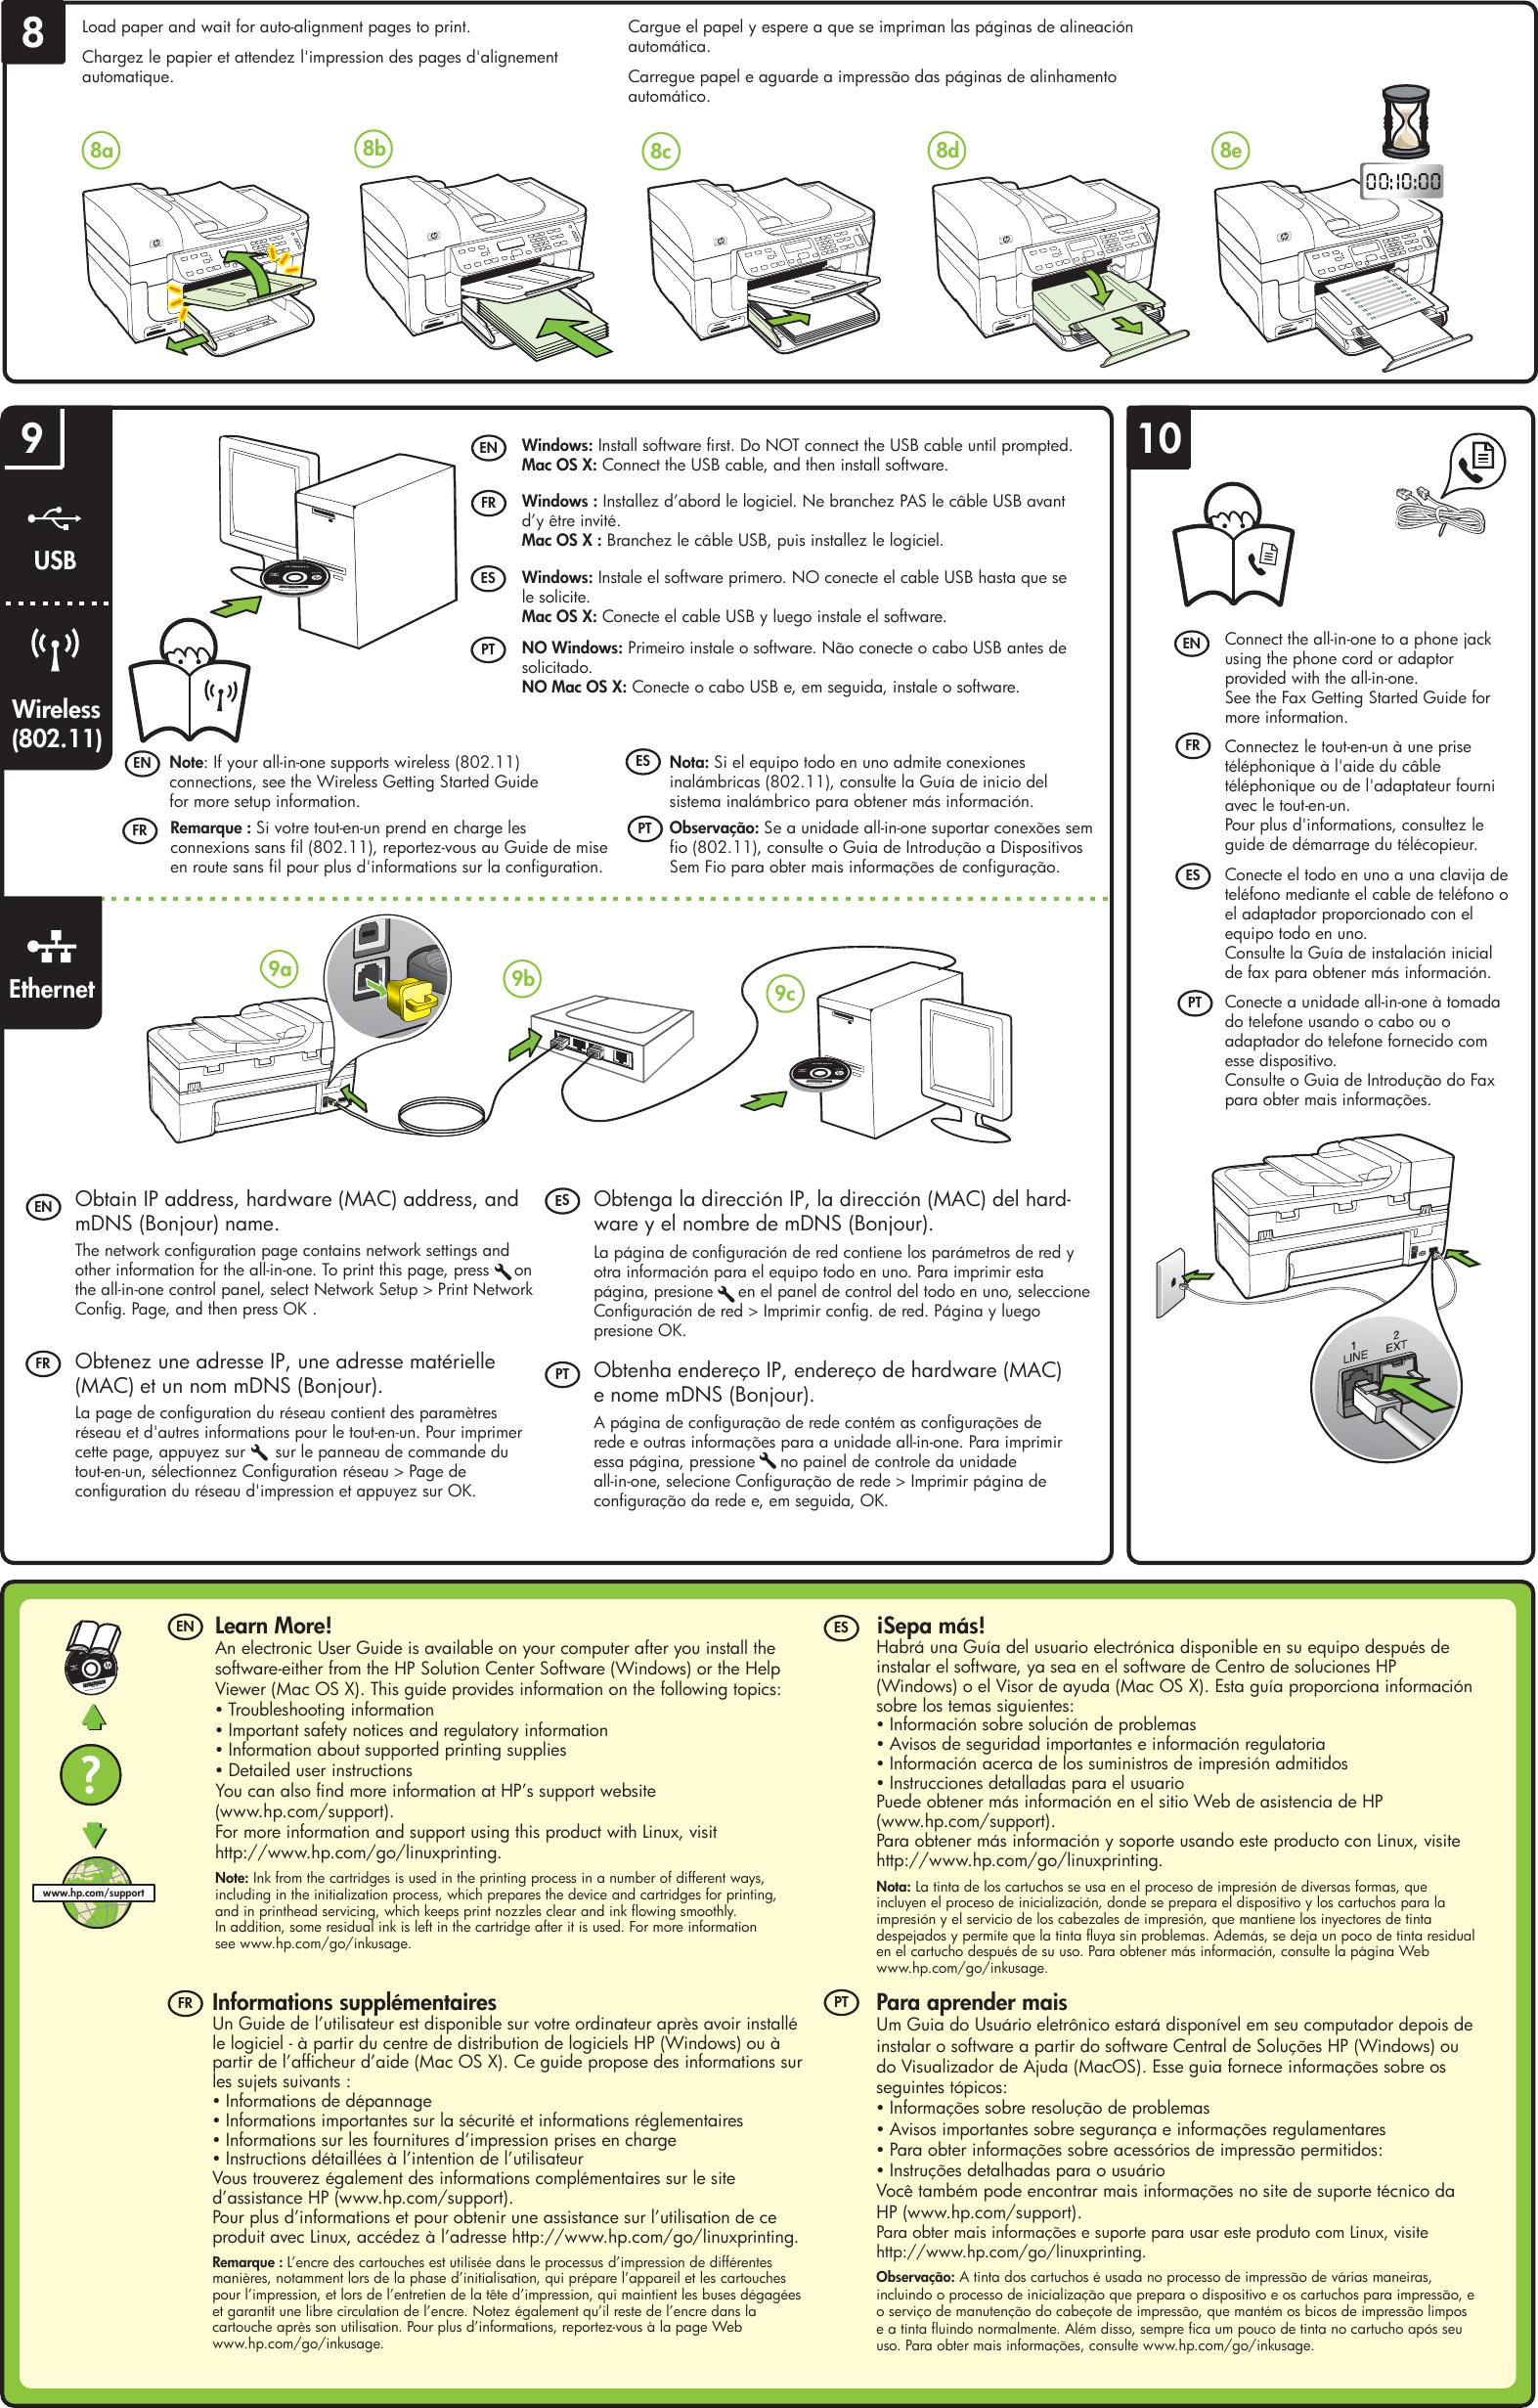 Hp Officejet 6500 E709n All Manual Guide